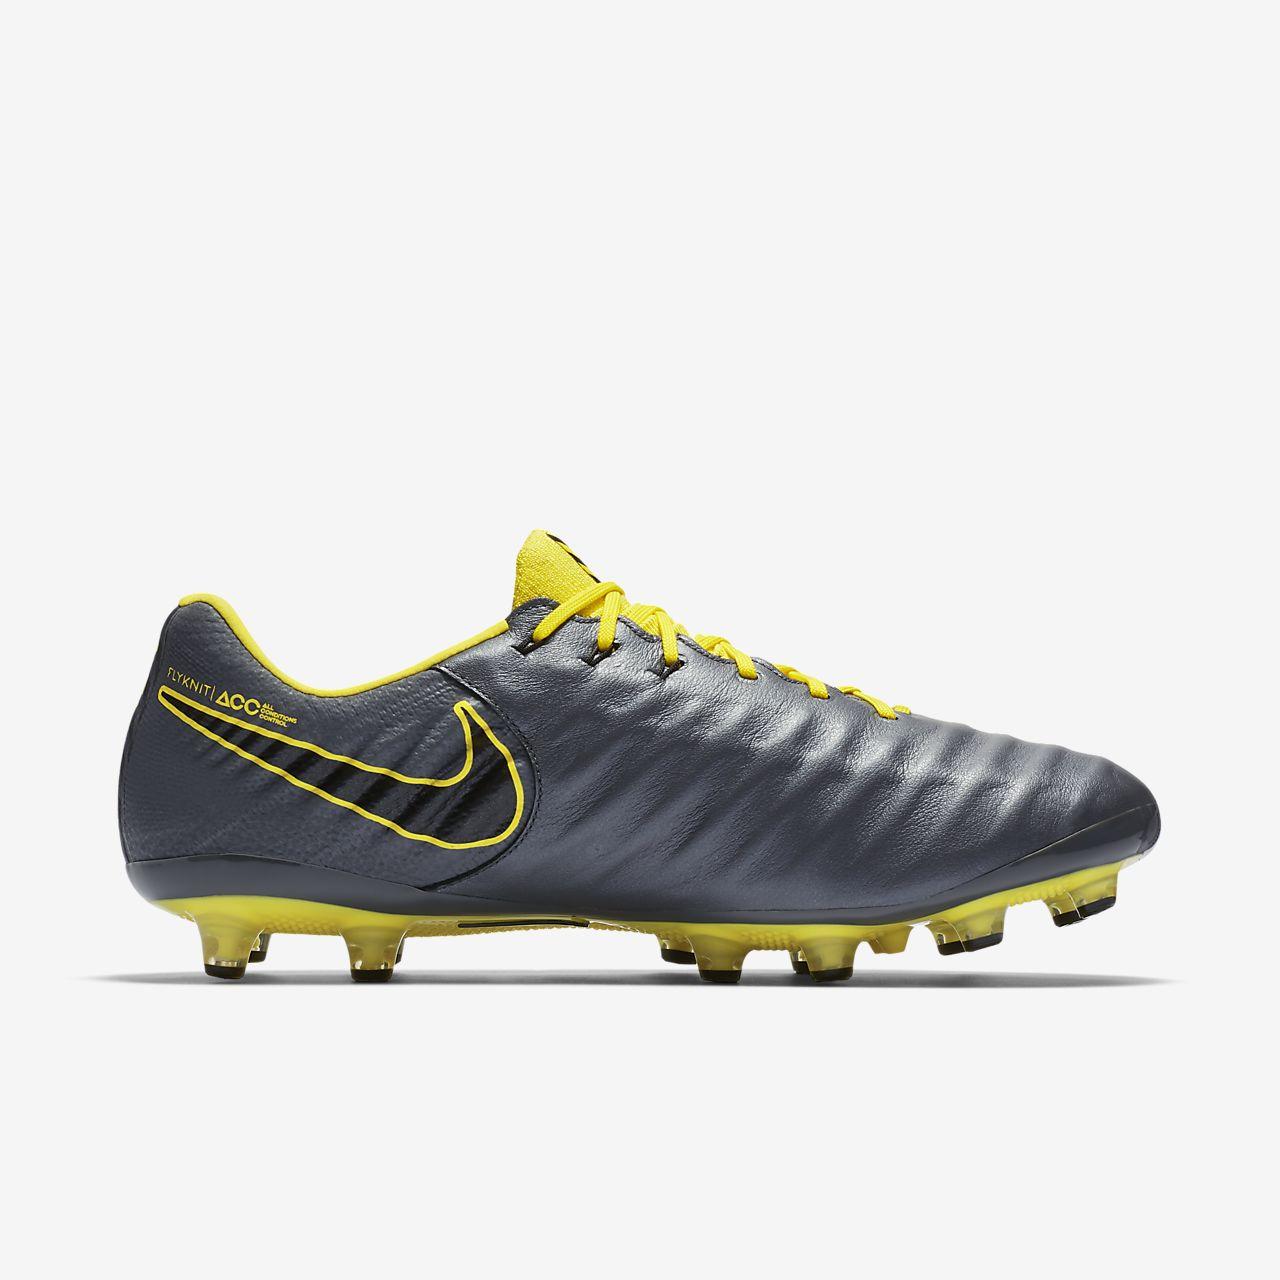 wholesale dealer 8570a fd9c5 ... Calzado de fútbol para pasto artificial Nike Legend VII Elite AG-PRO